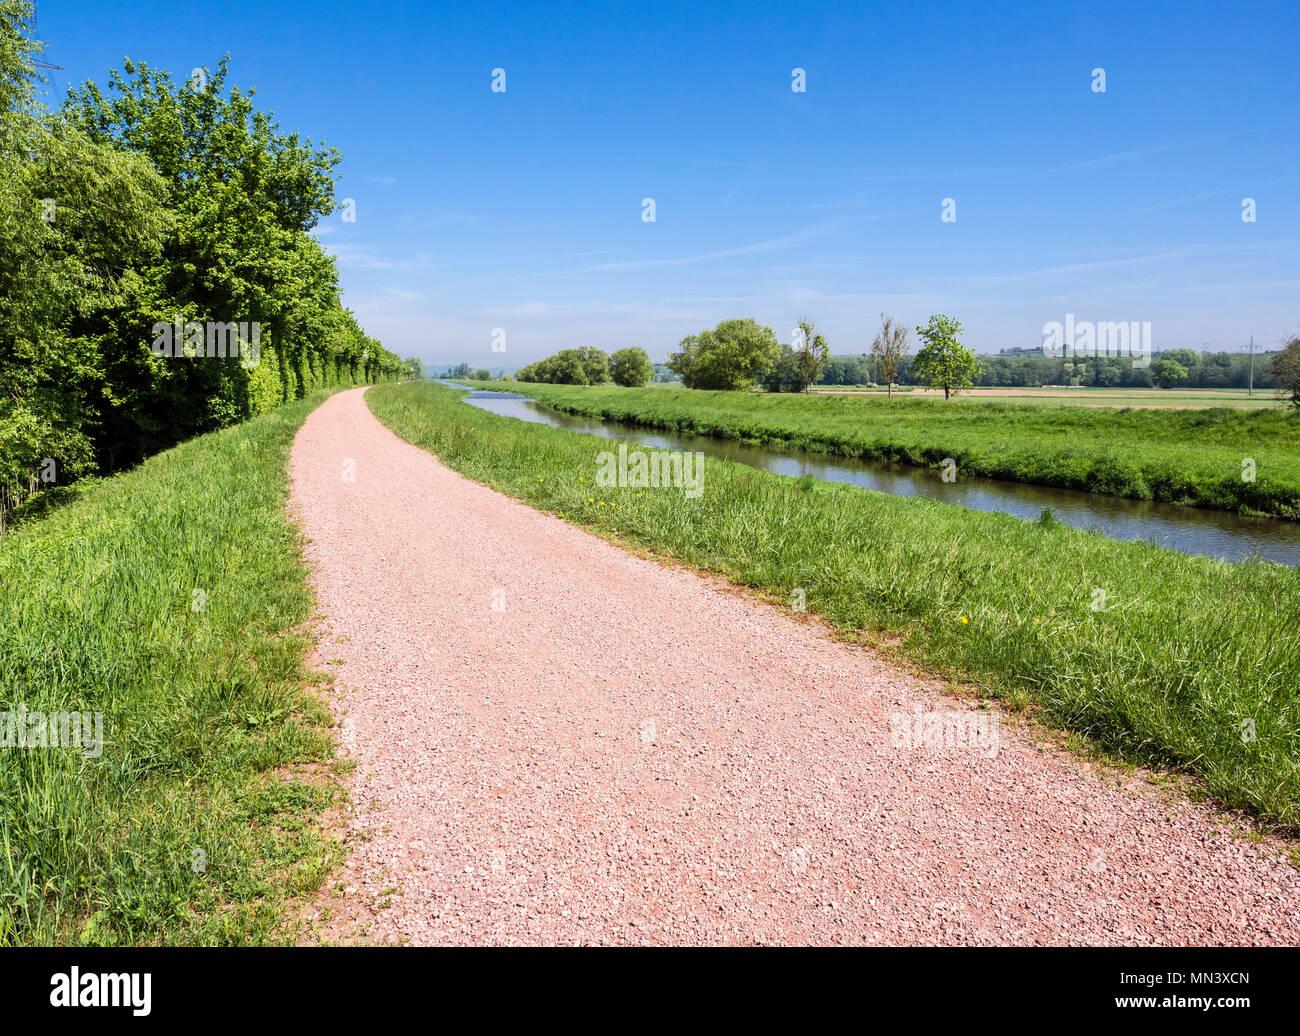 Cycle path along river Dreisam, meadows at the river, Freiburg, Breisgau, Baden-Würtemberg, Germany Stock Photo